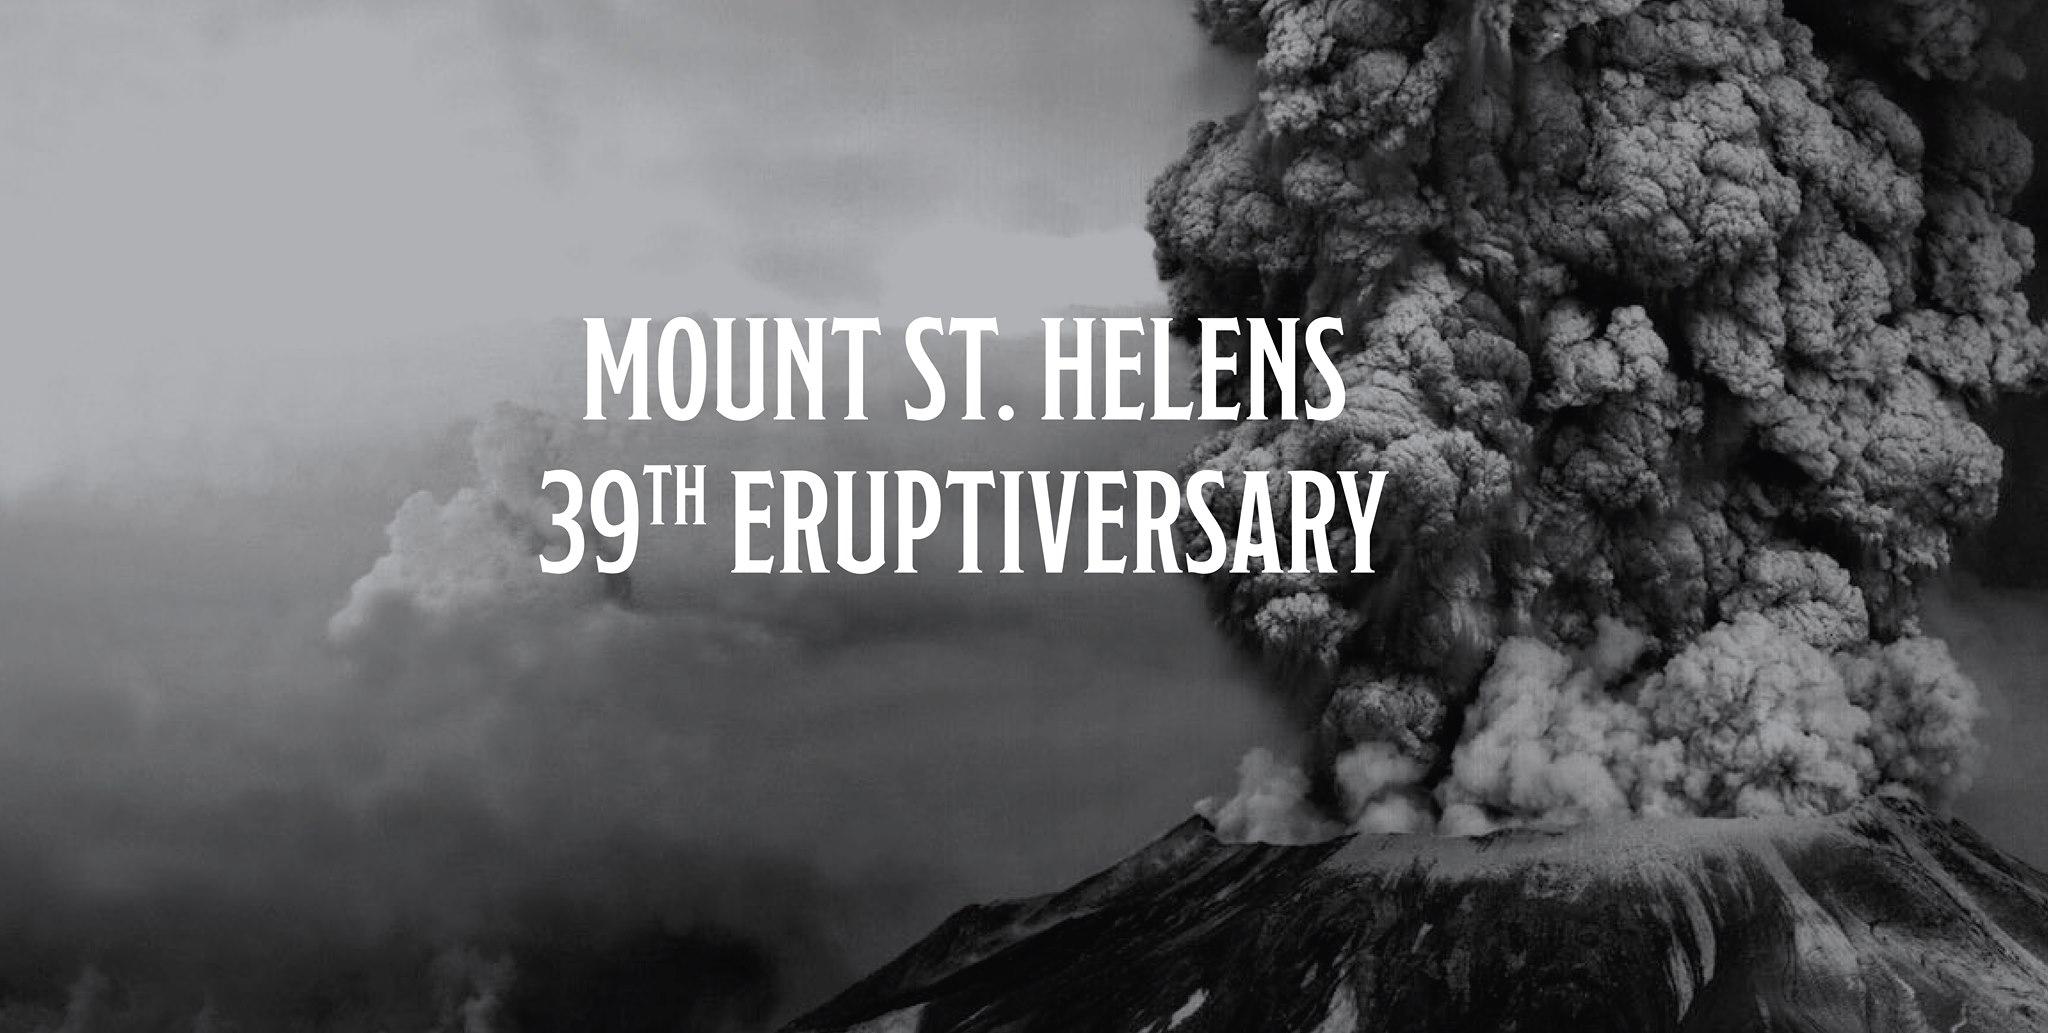 Mount St. Helens 39th Eruptiversary!